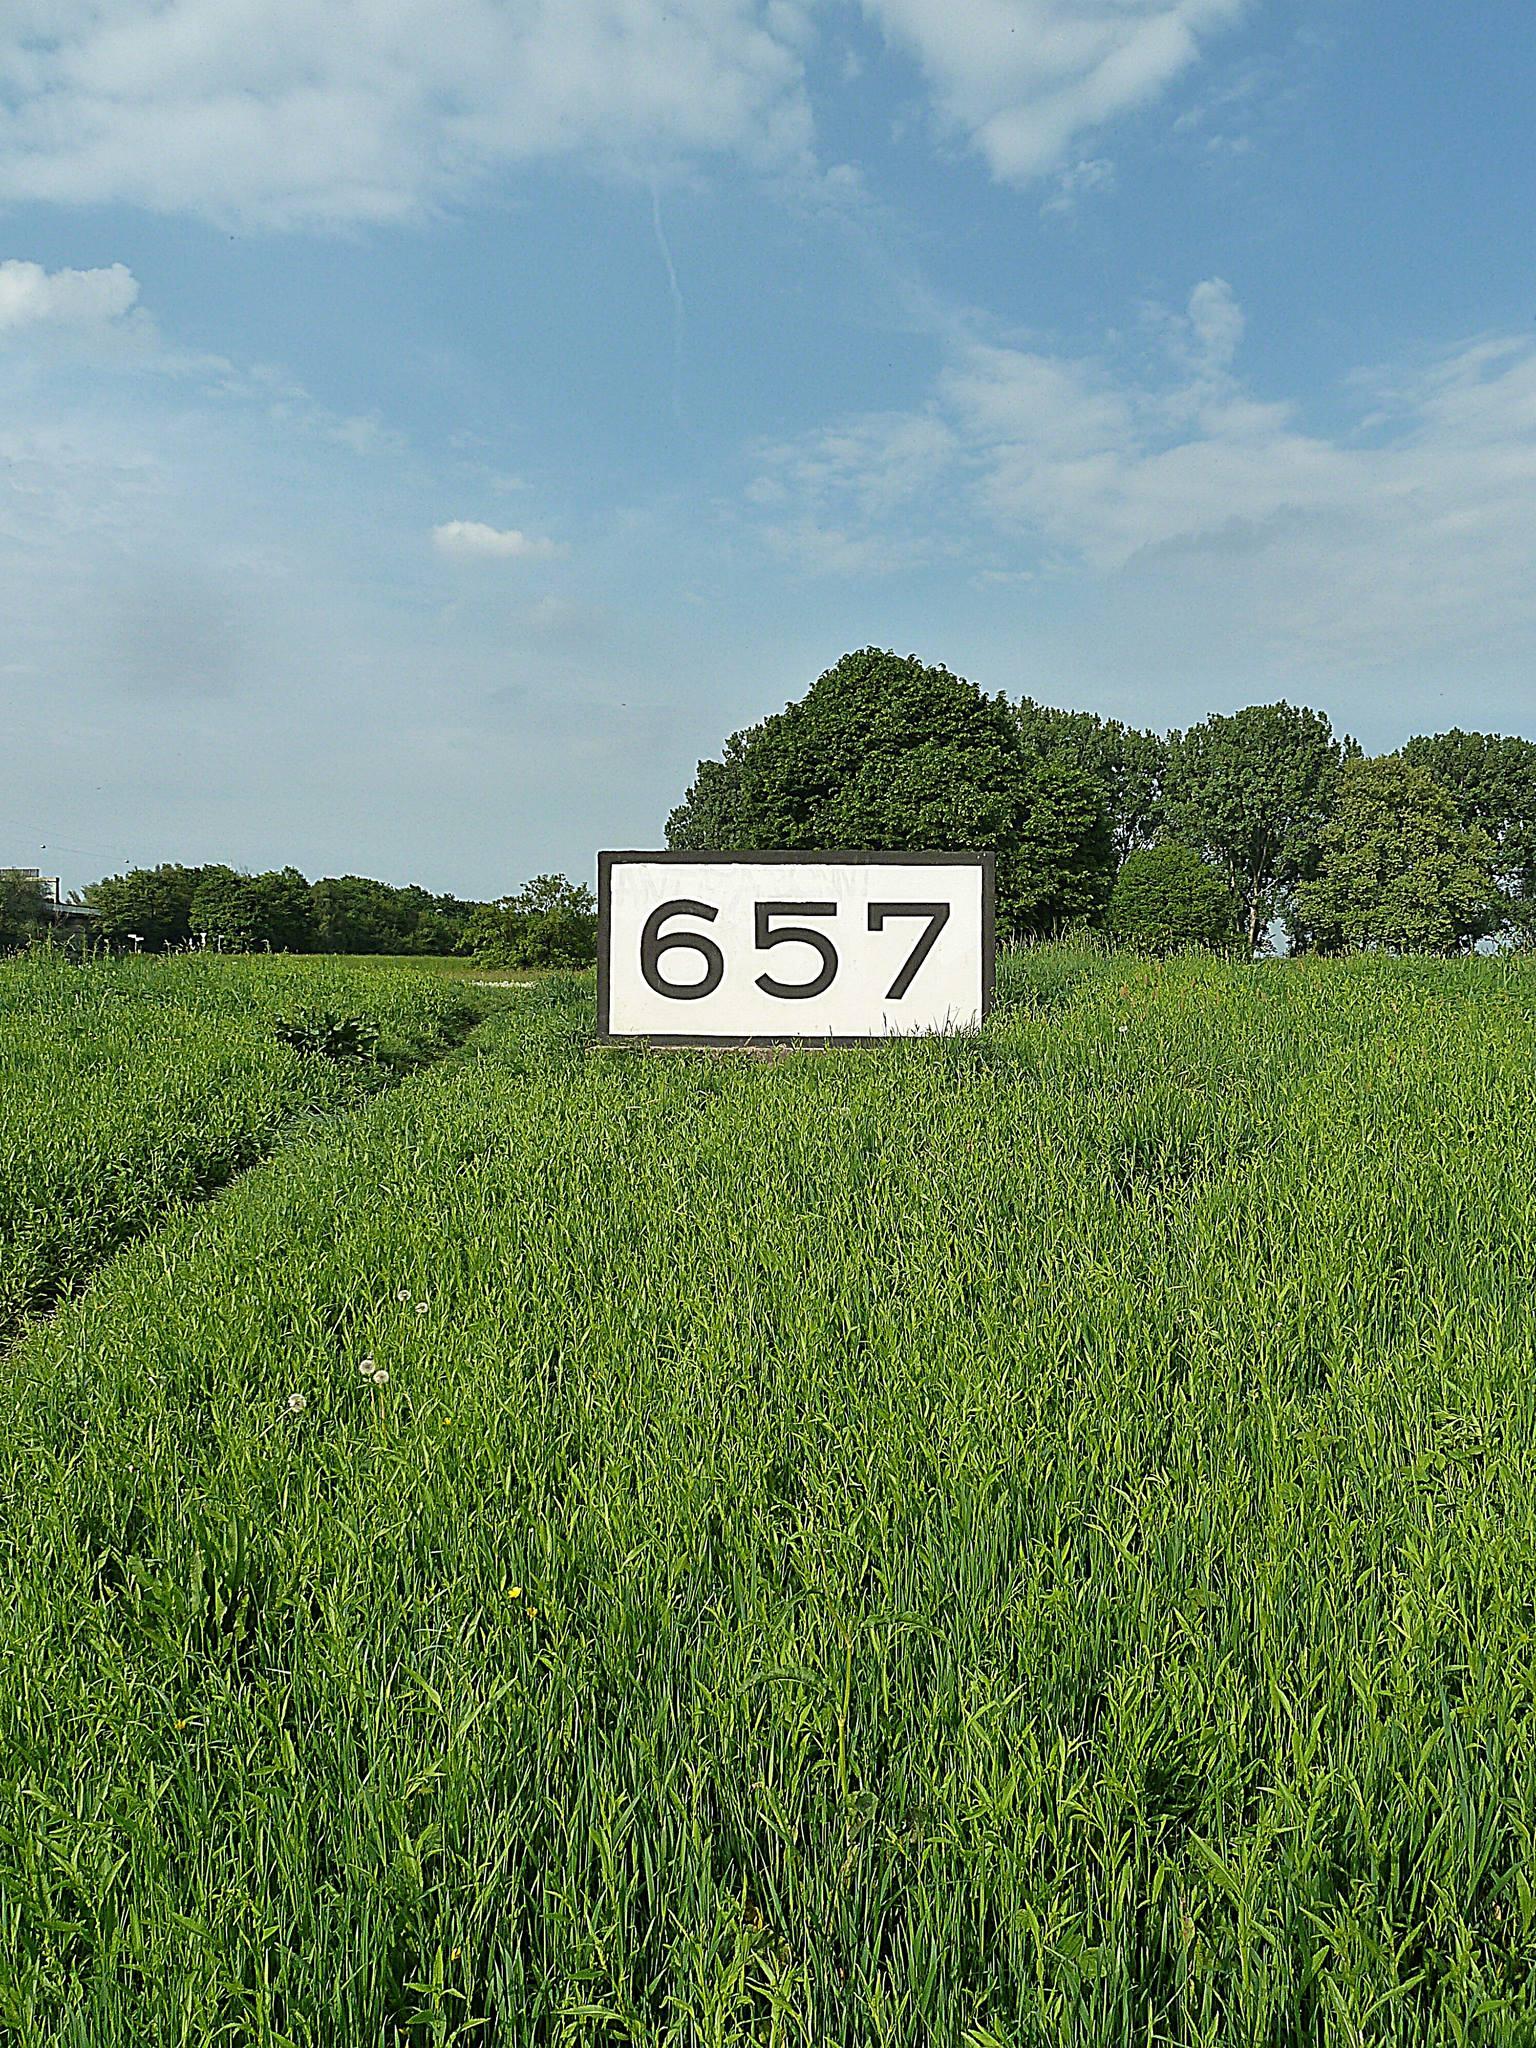 rheinkilometer-657